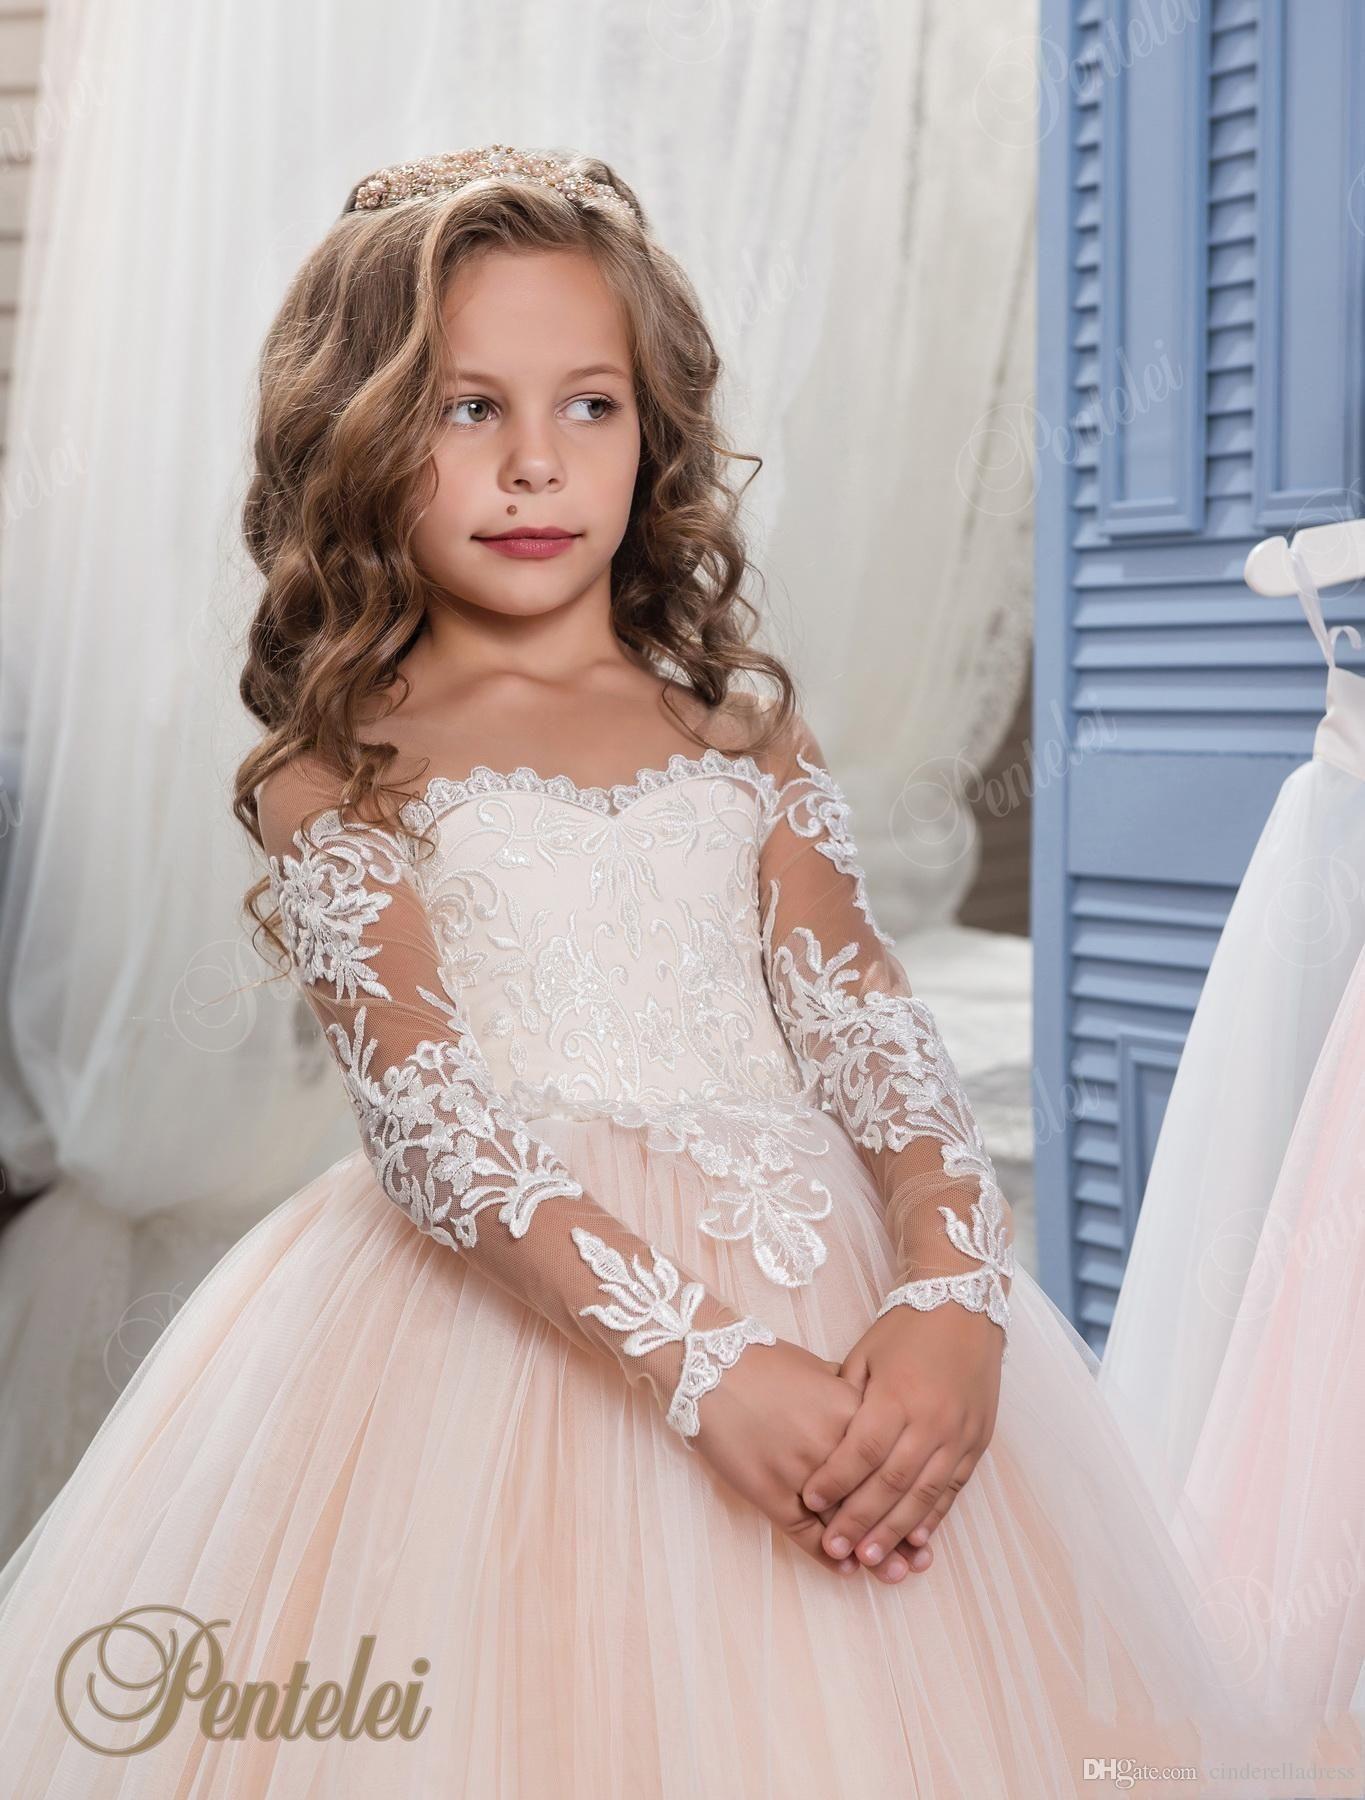 7b291e26077 Kids Flower Girls Dresses for Weddings 2017 Pentelei with Illusion Long  Sleeves Tulle Blush Little Girls Gowns Arabic Kids Pageant Dress mz